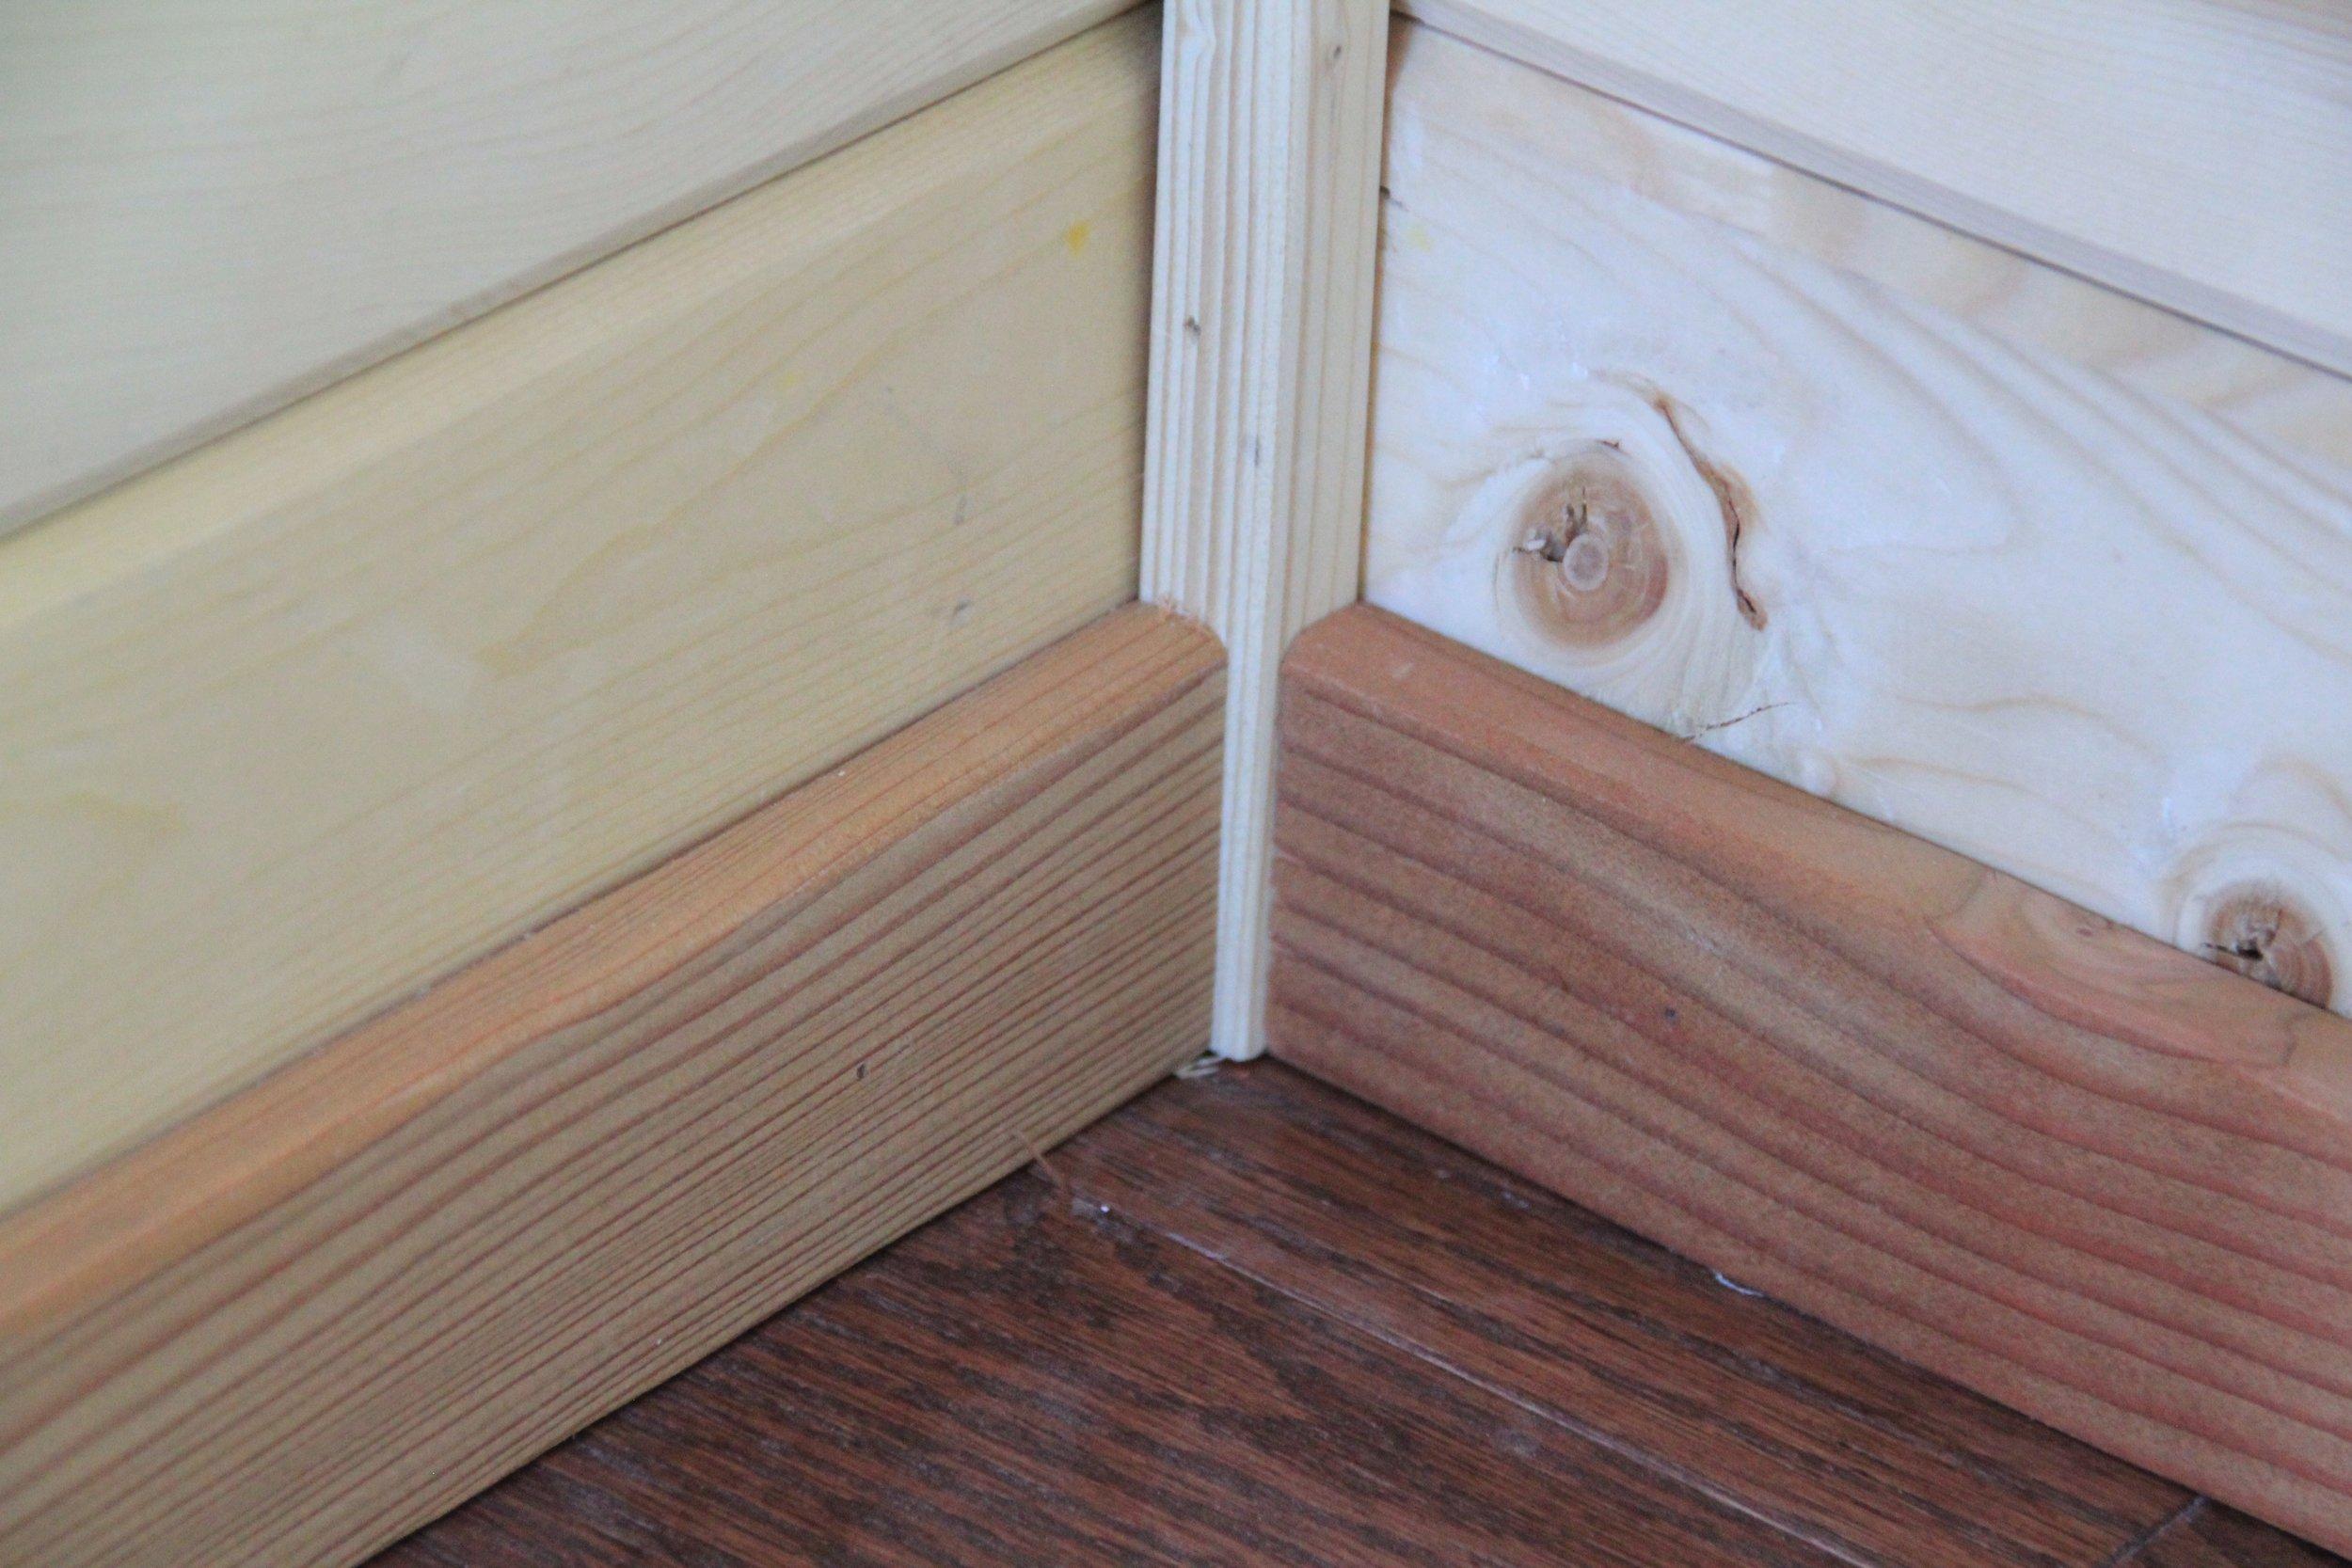 At floor-level, the junction between dark Oak flooring, reclaimed Fir baseboards, and vertical Pine corner trim.